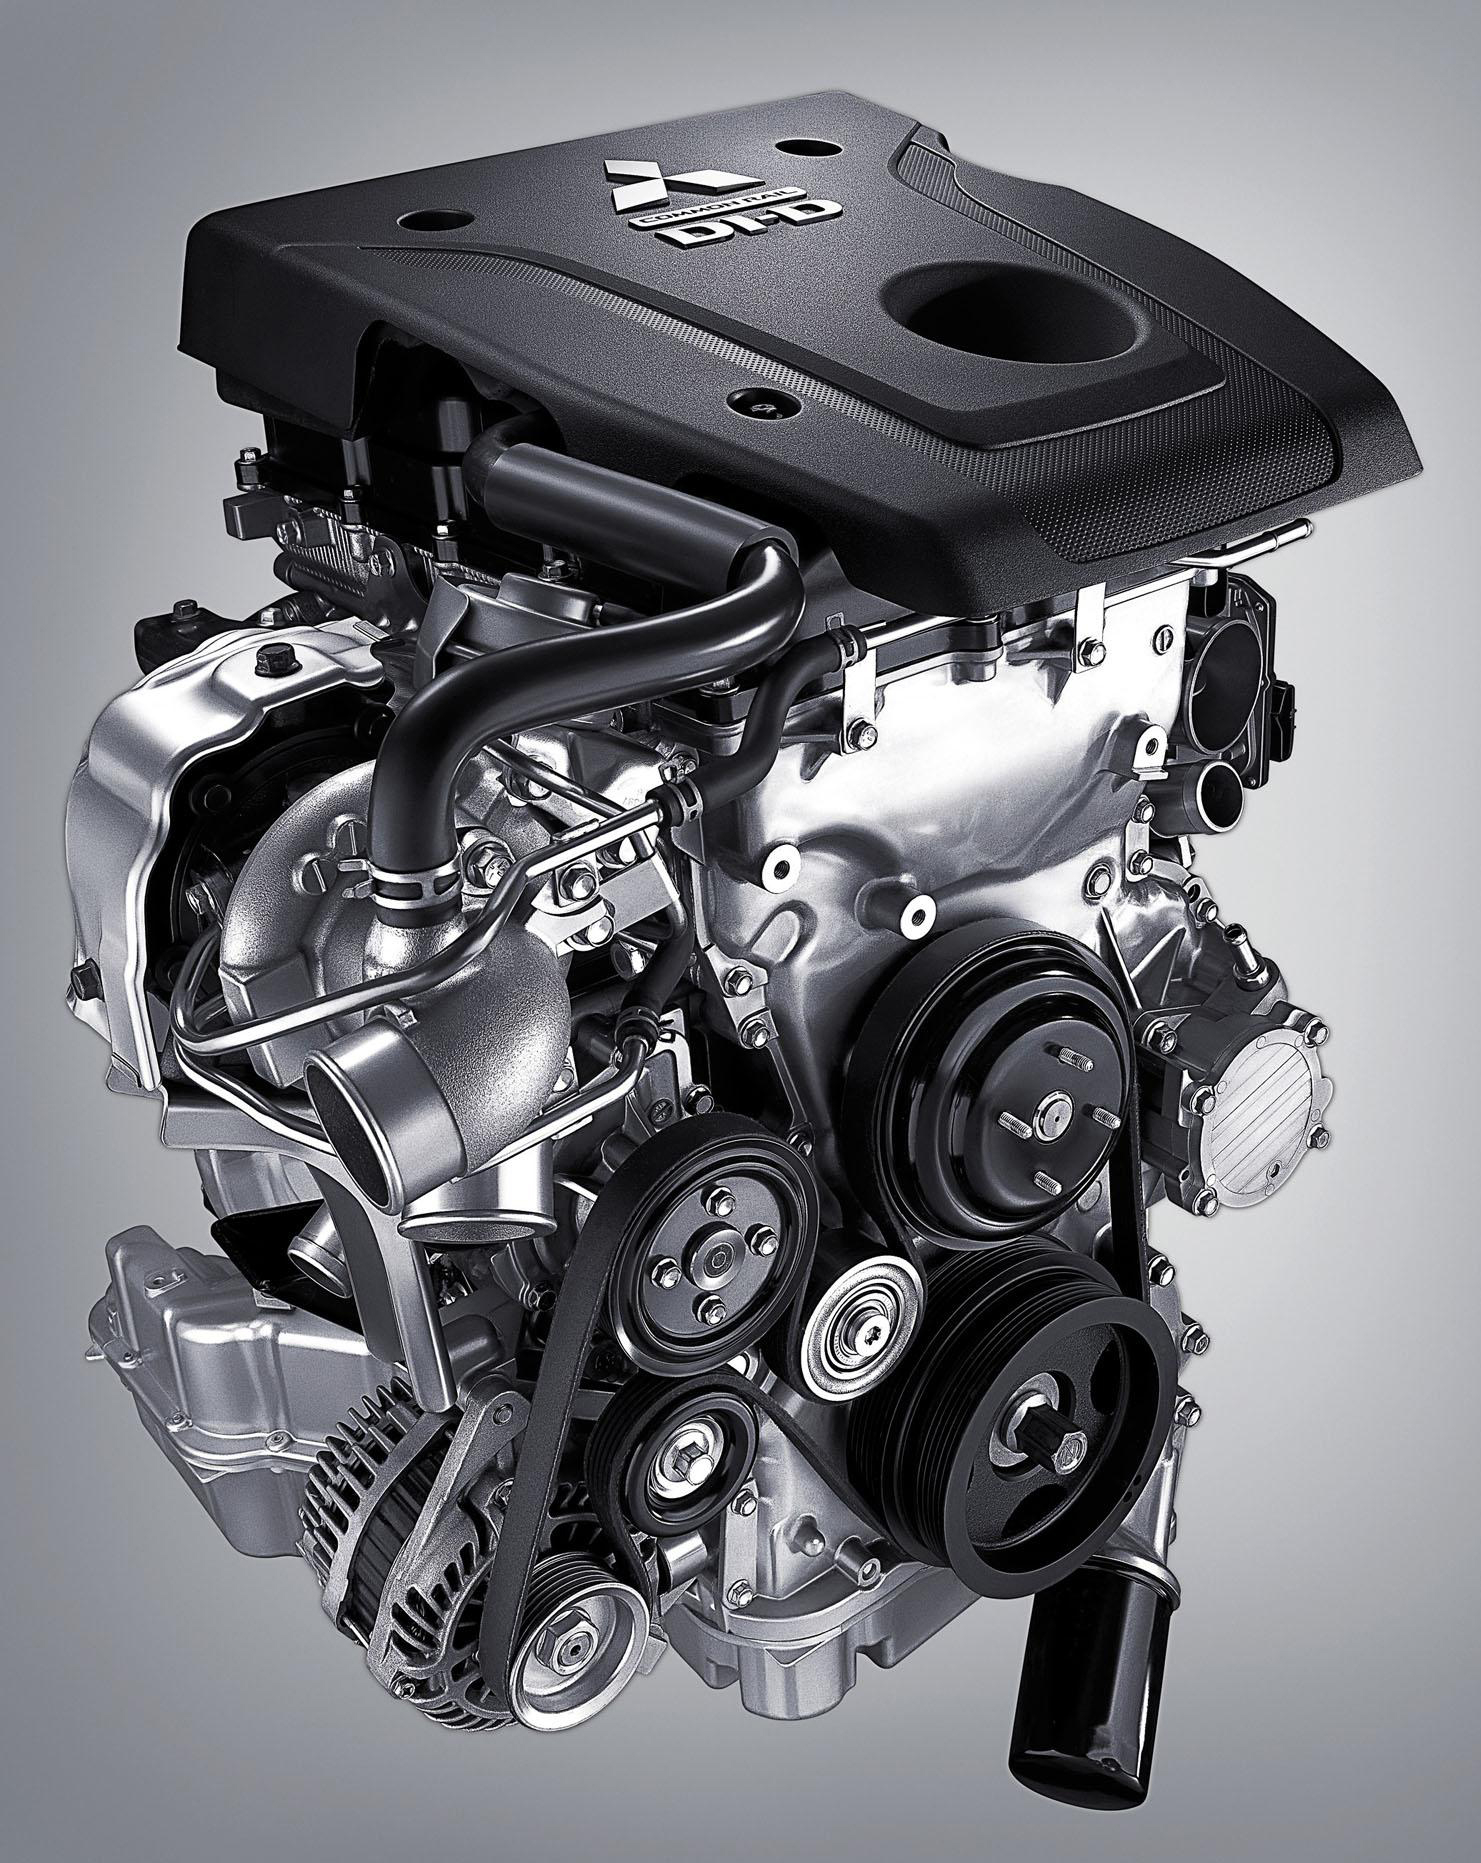 2015 Mitsubishi Triton Unveiled Gets New 2 4l Engine